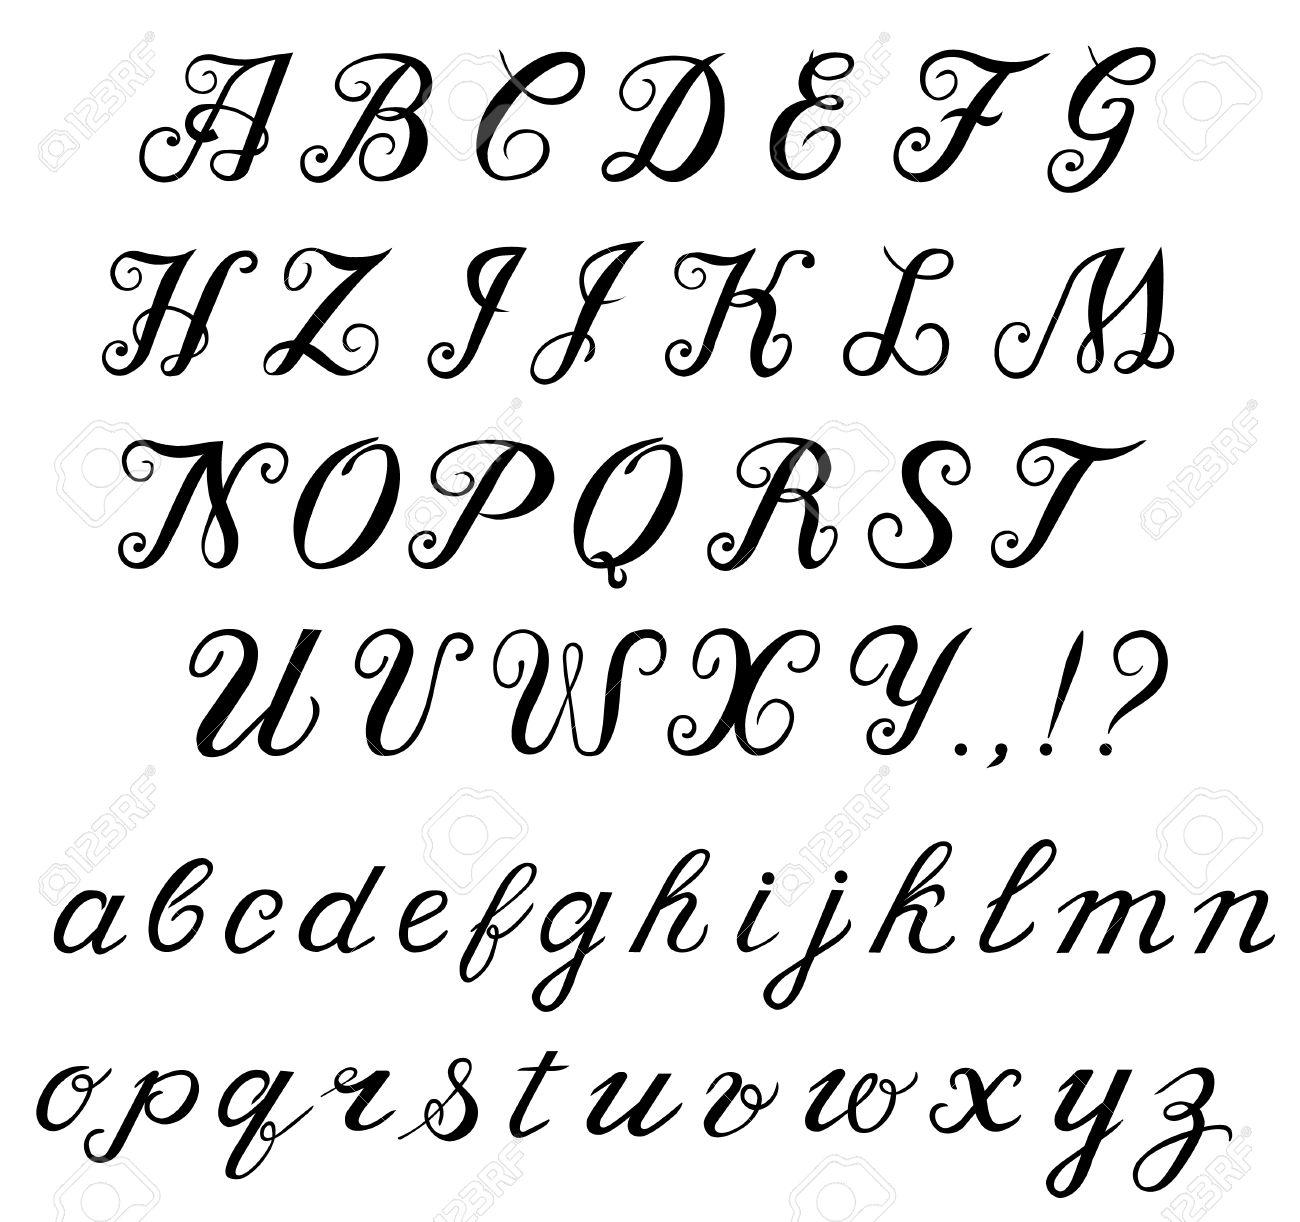 Elegant Letters Hand Written Calligraphic Font Alphabet Capital